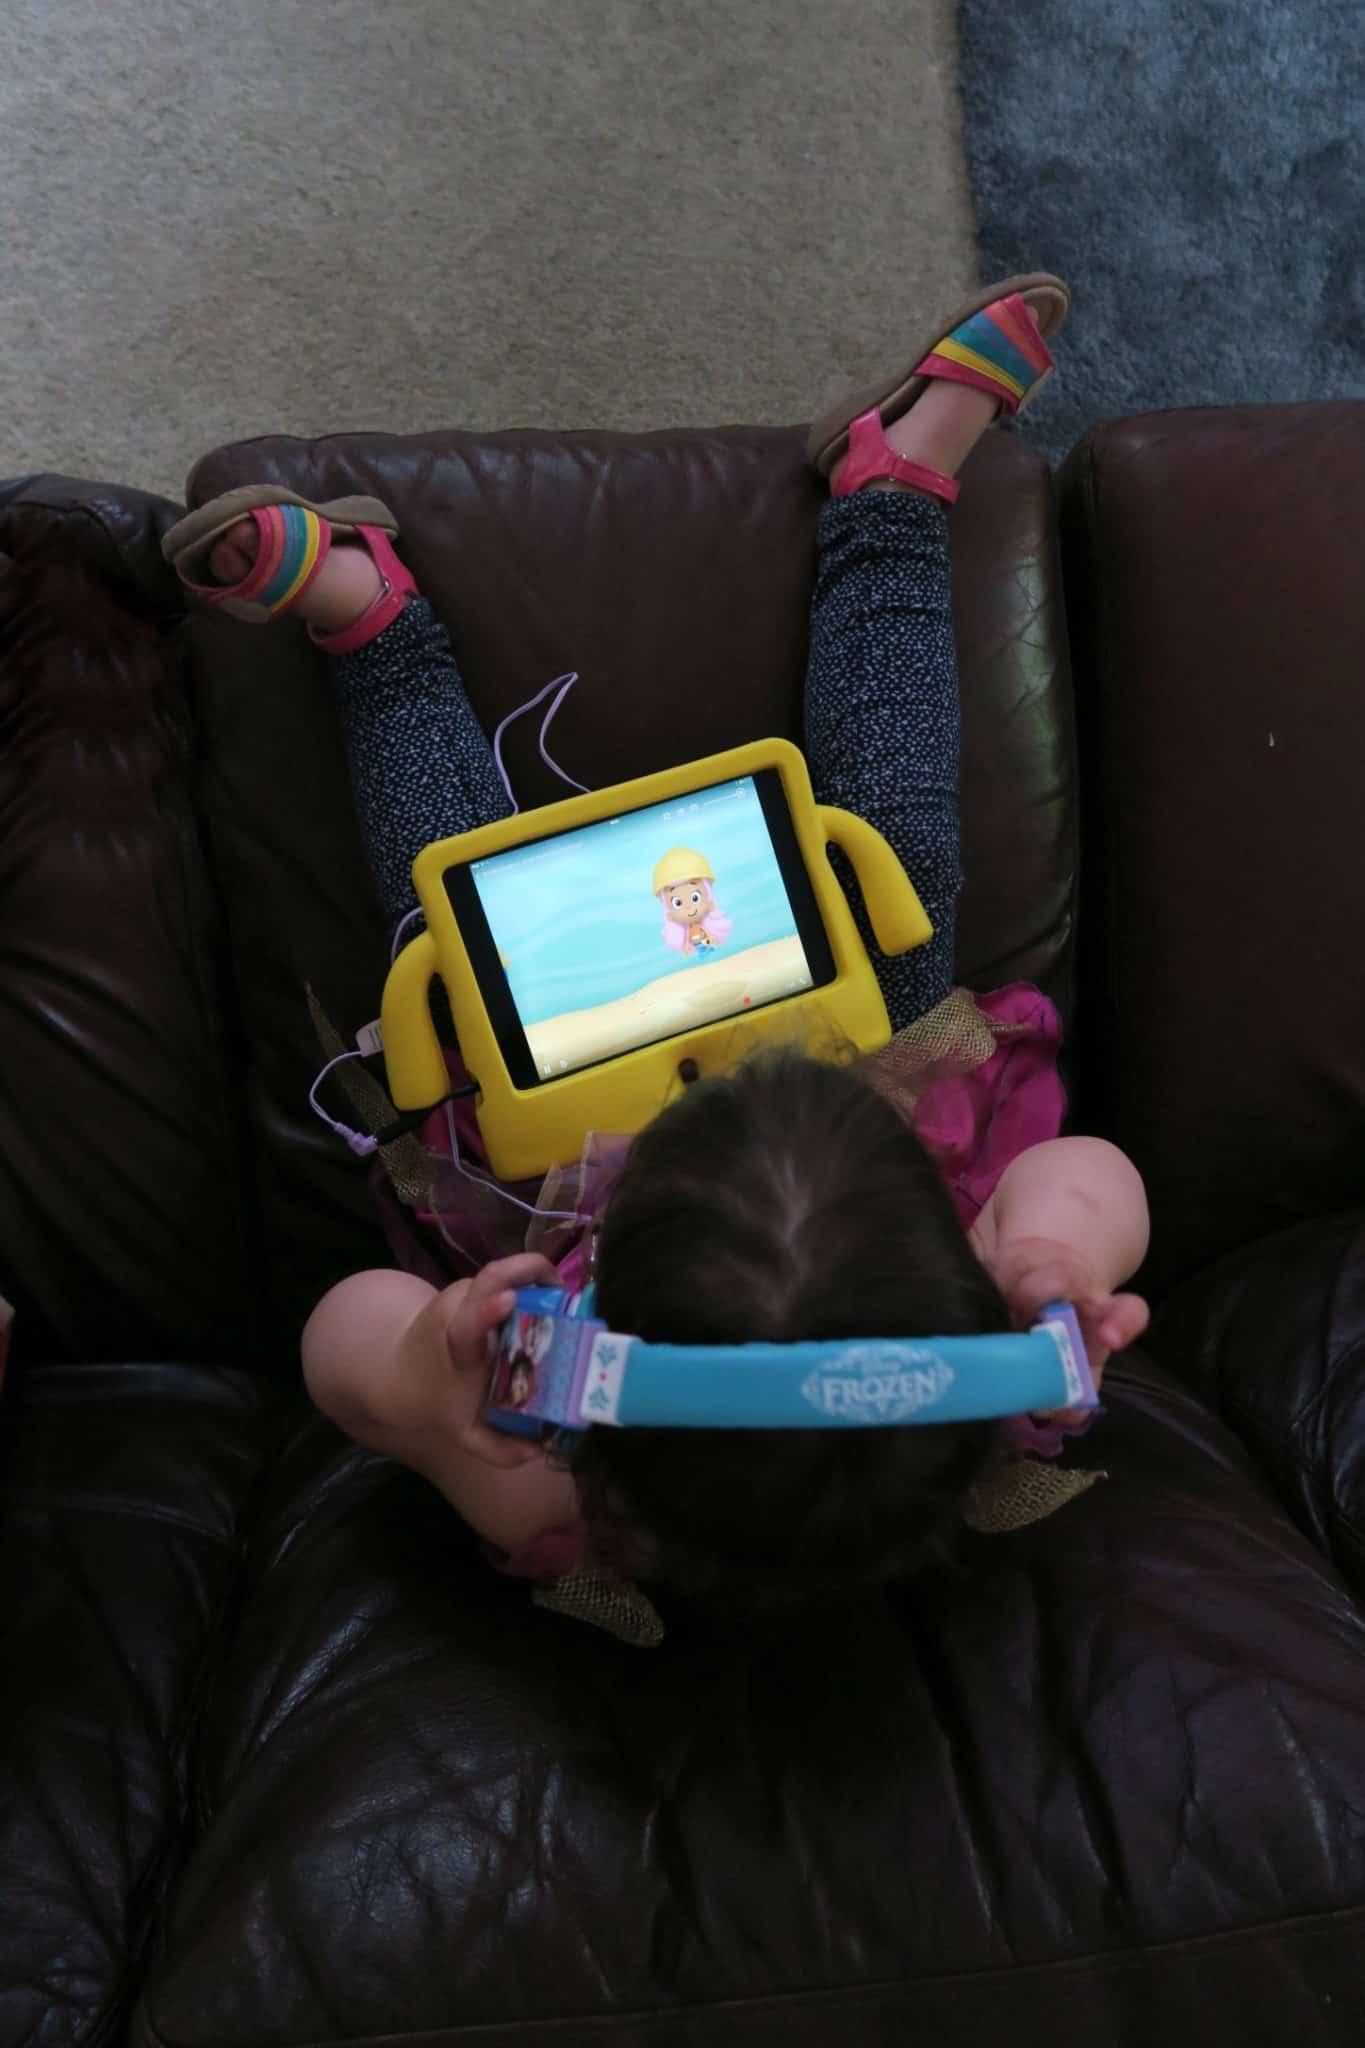 Watching Bubble guppies on Neflix on an iPad